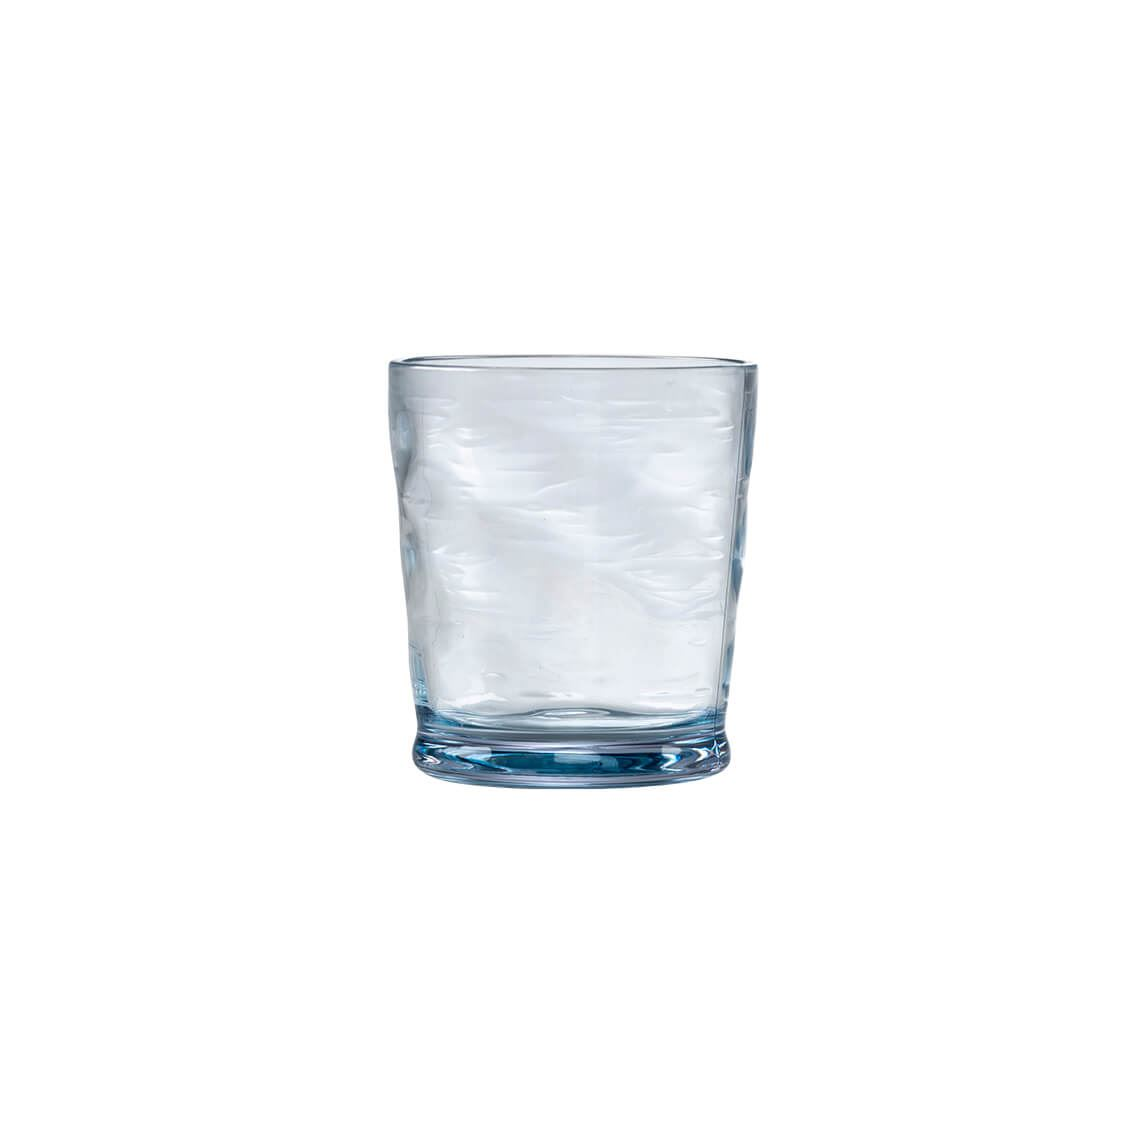 Aegean Tumbler Size W 10cm x D 10cm x H 11cm in Blue Acrylonitrile Styrene Freedom